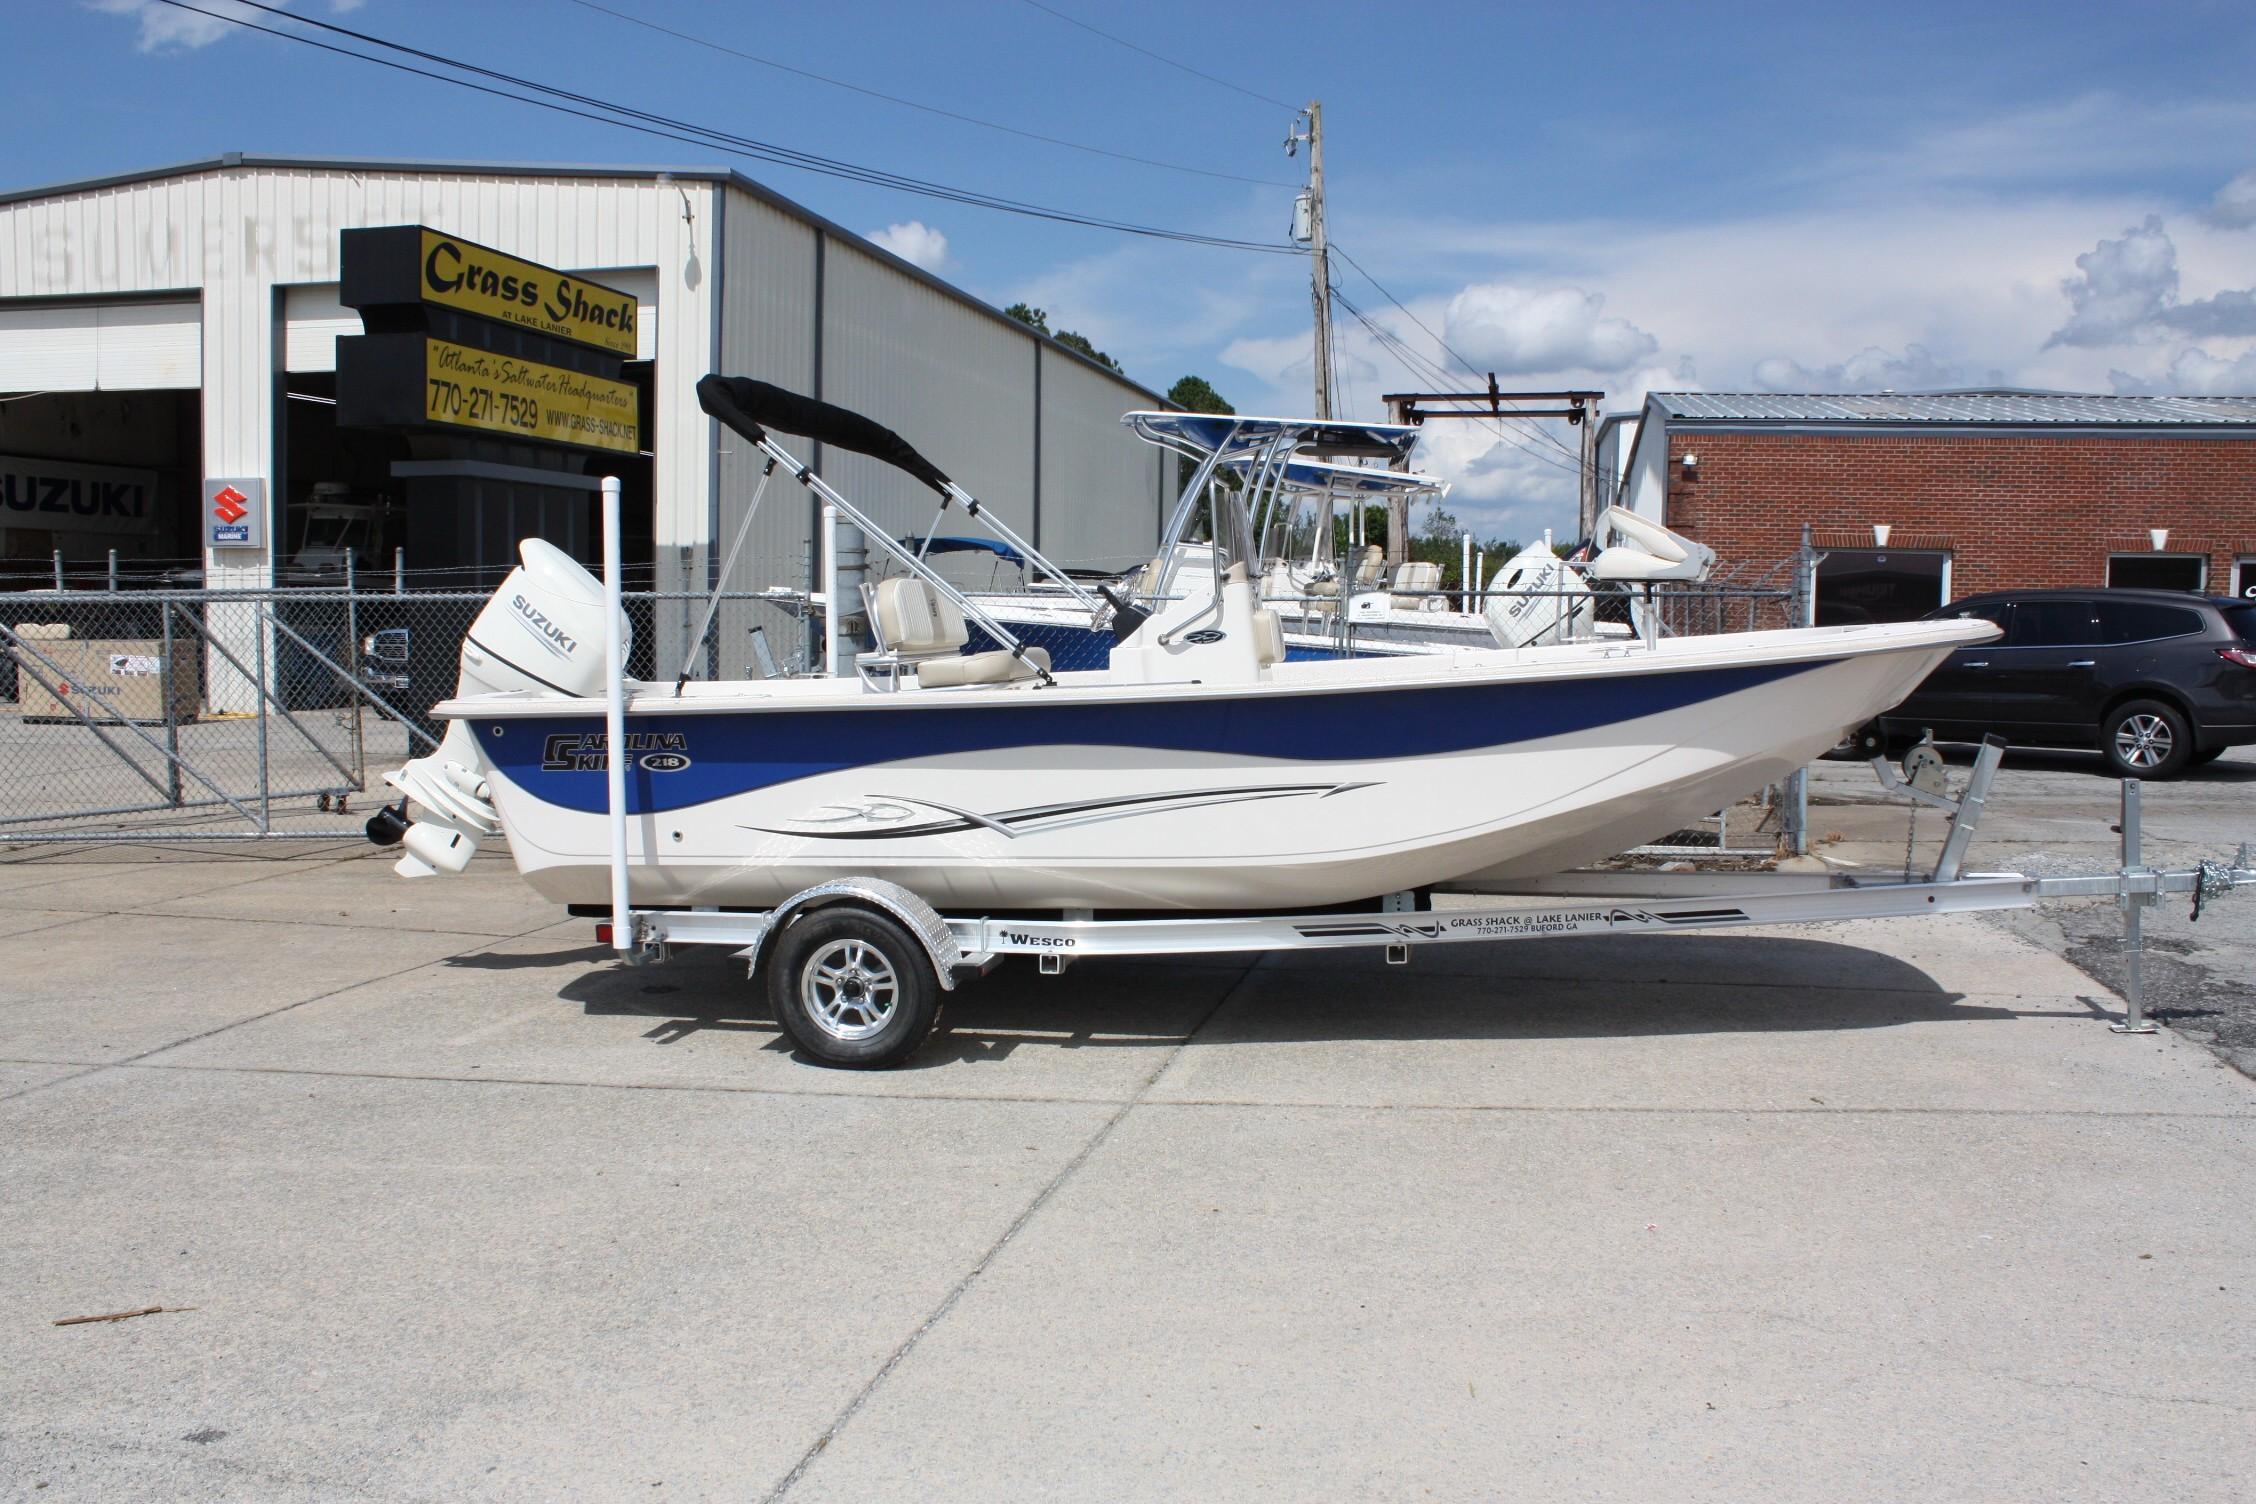 Carolina Skiff Wiring Diagram Dlv Harness Boats For Sale Grass Shack Console 218